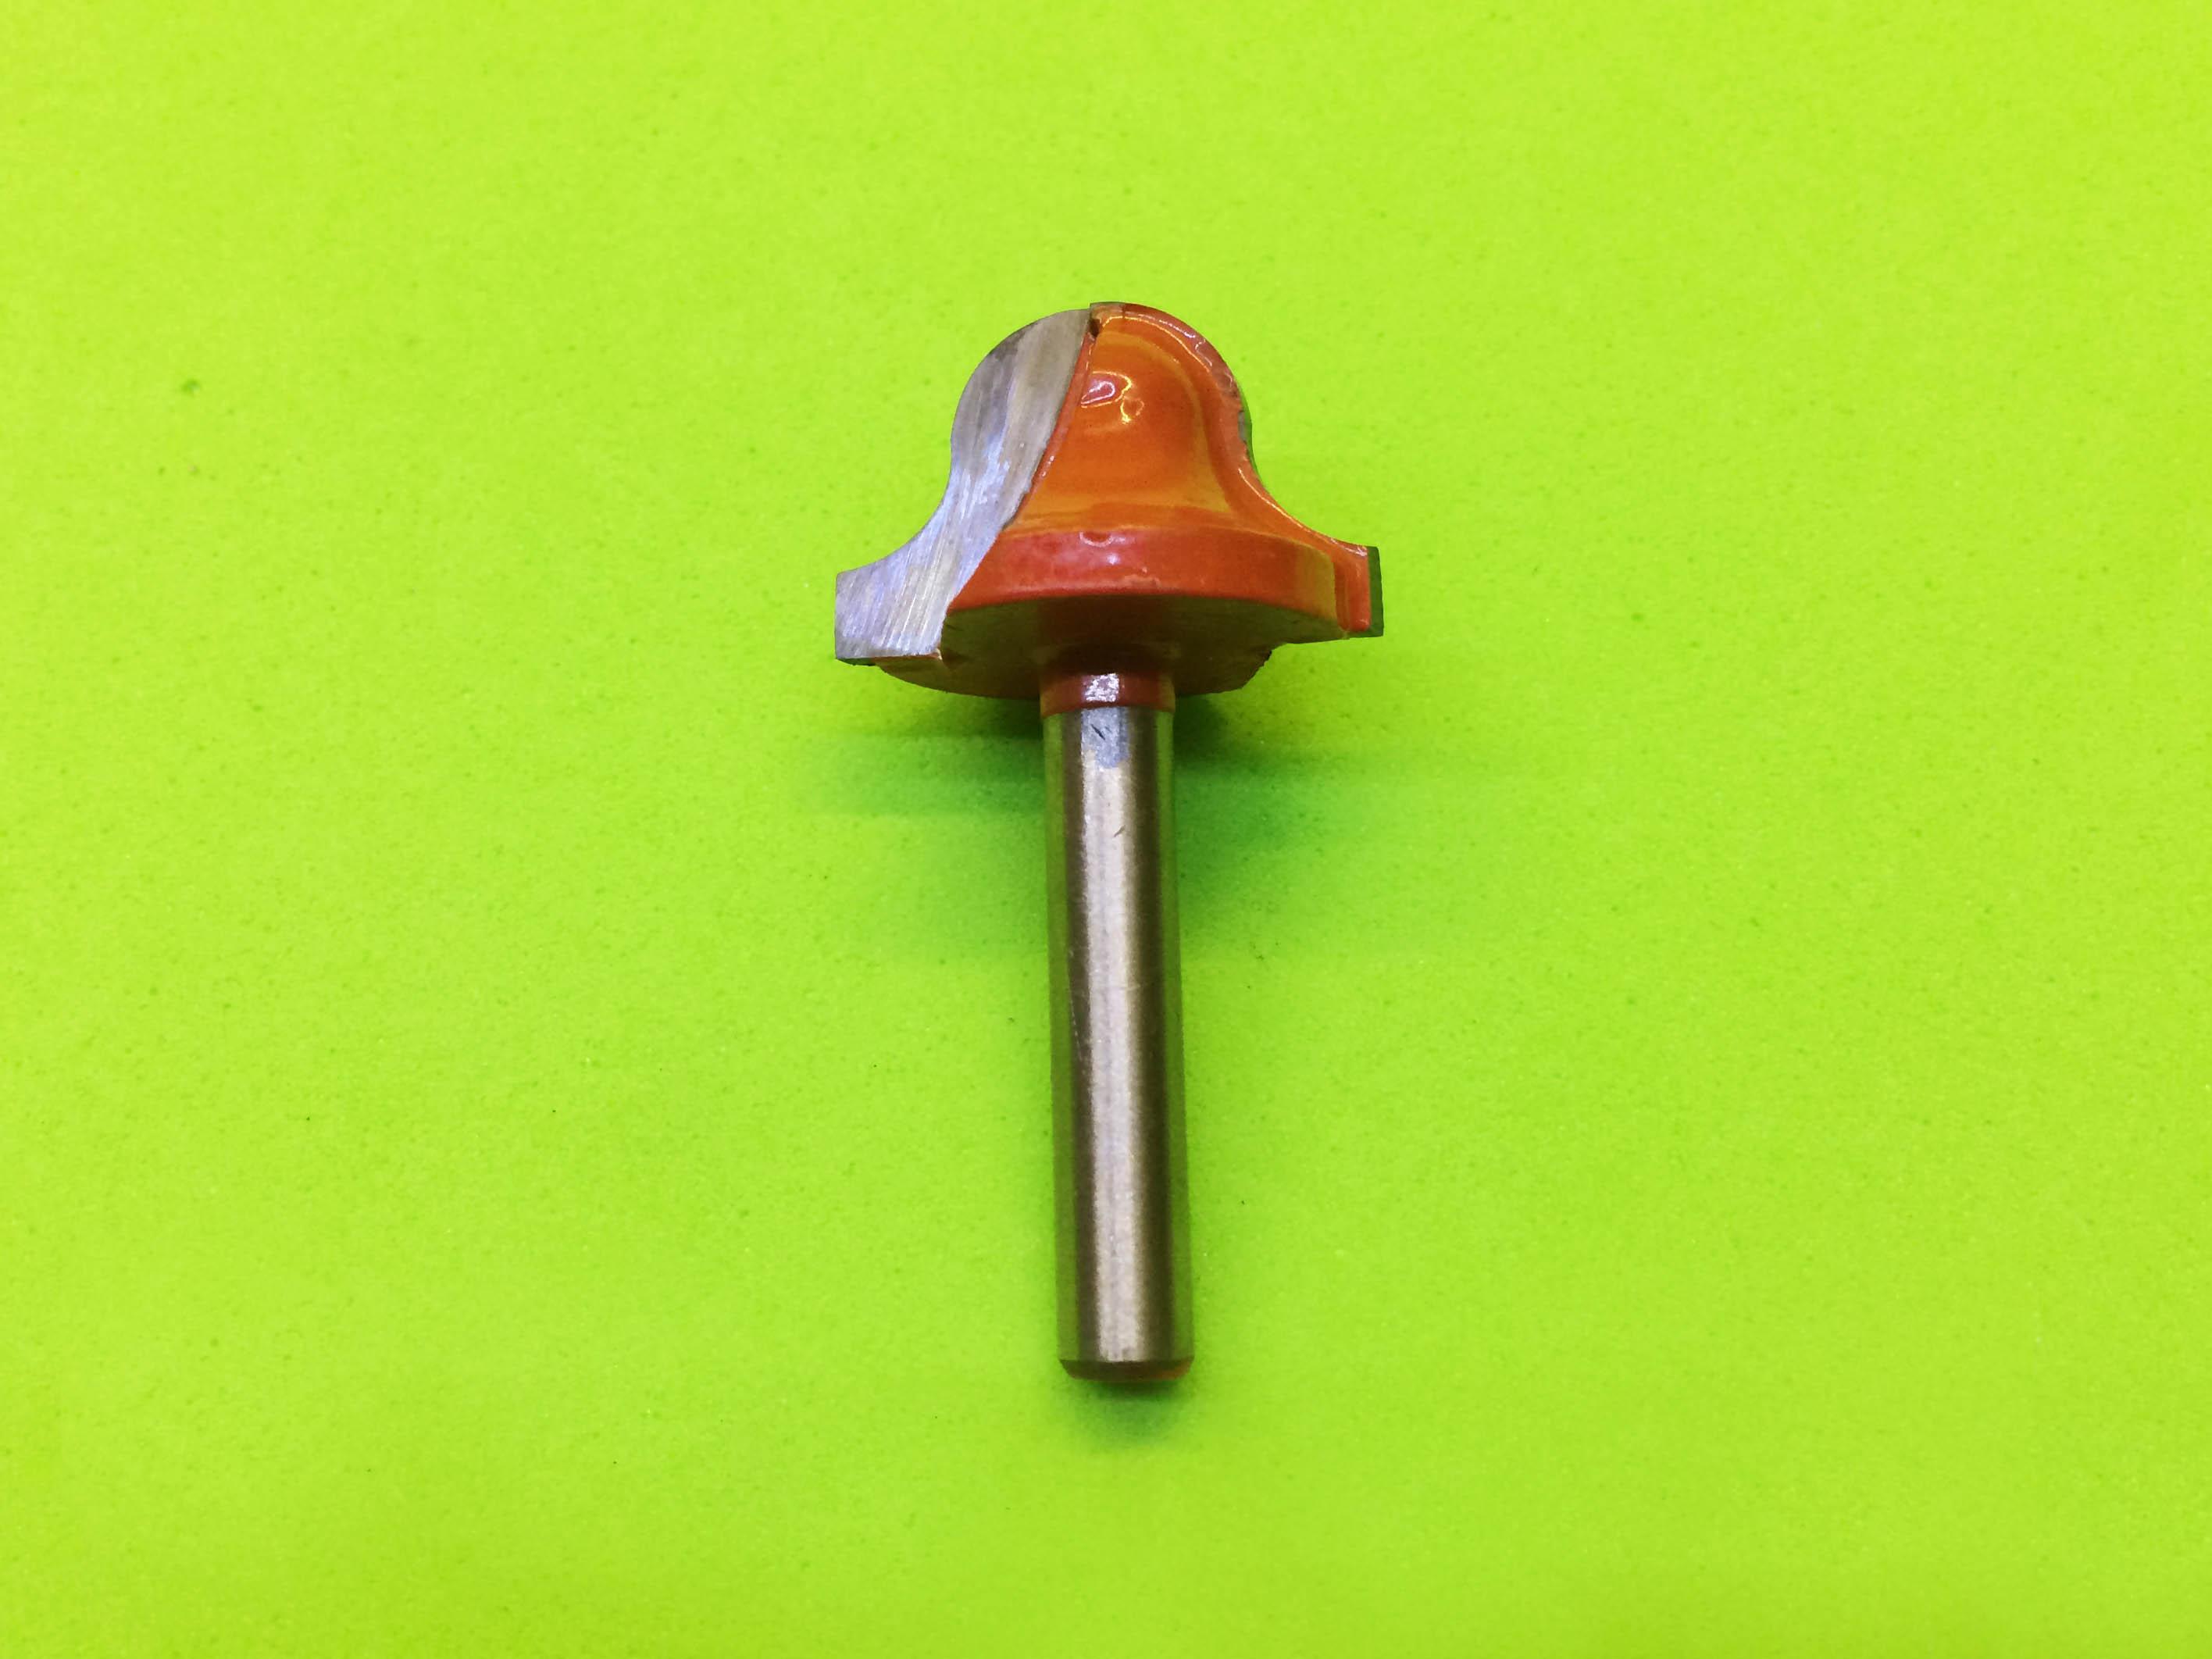 Mũi phay gỗ tạo kiểu C trục 6mm